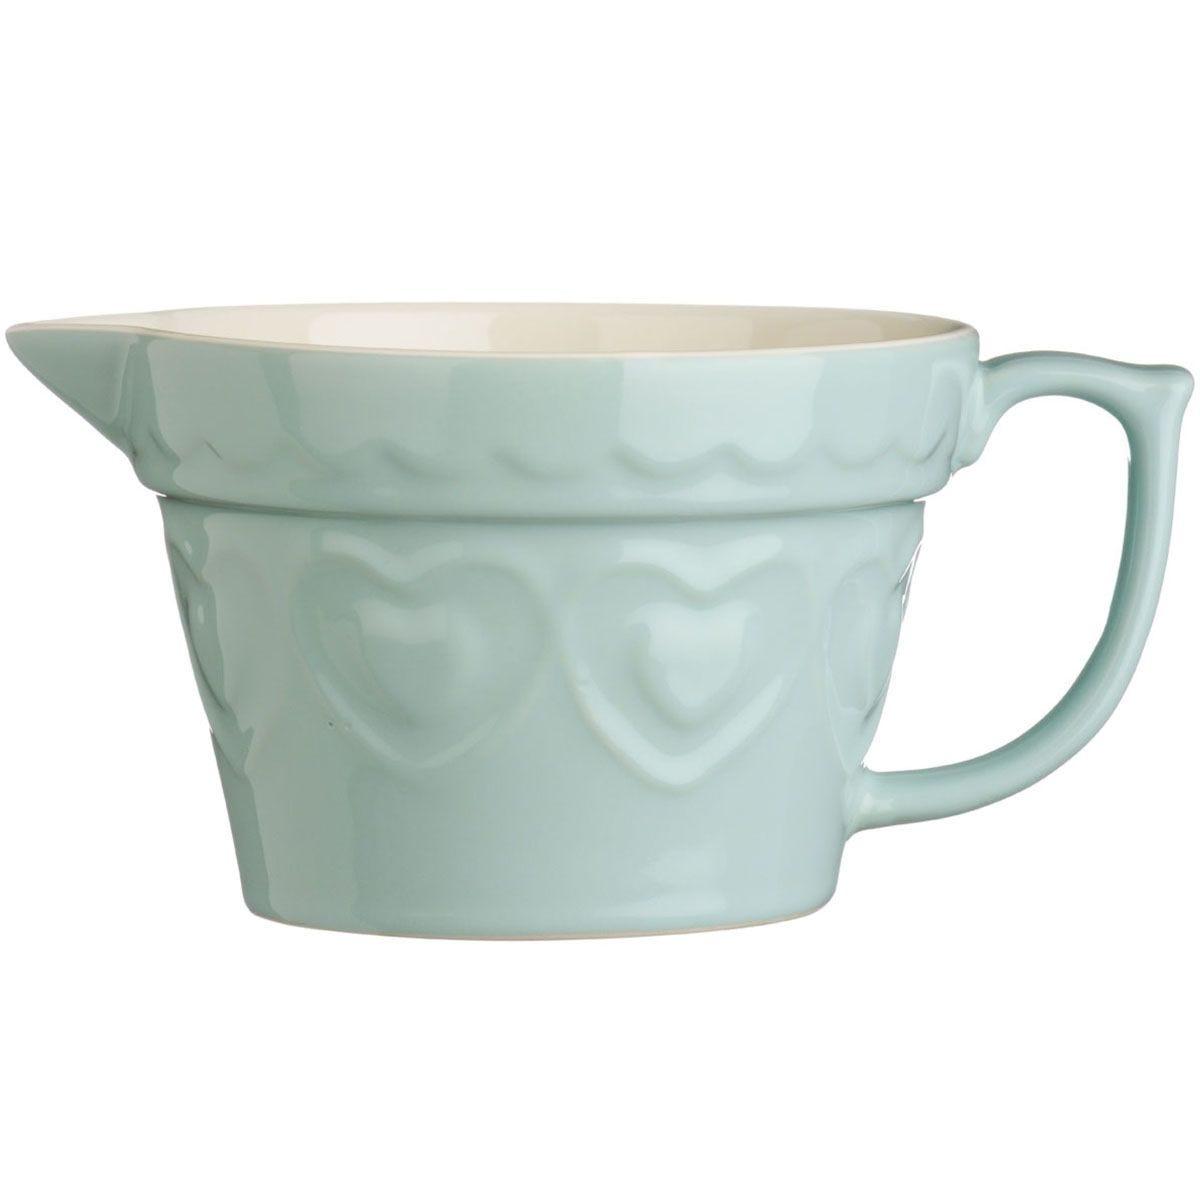 Premier Housewares 1.7L Sweet Heart Basting Jug - Green